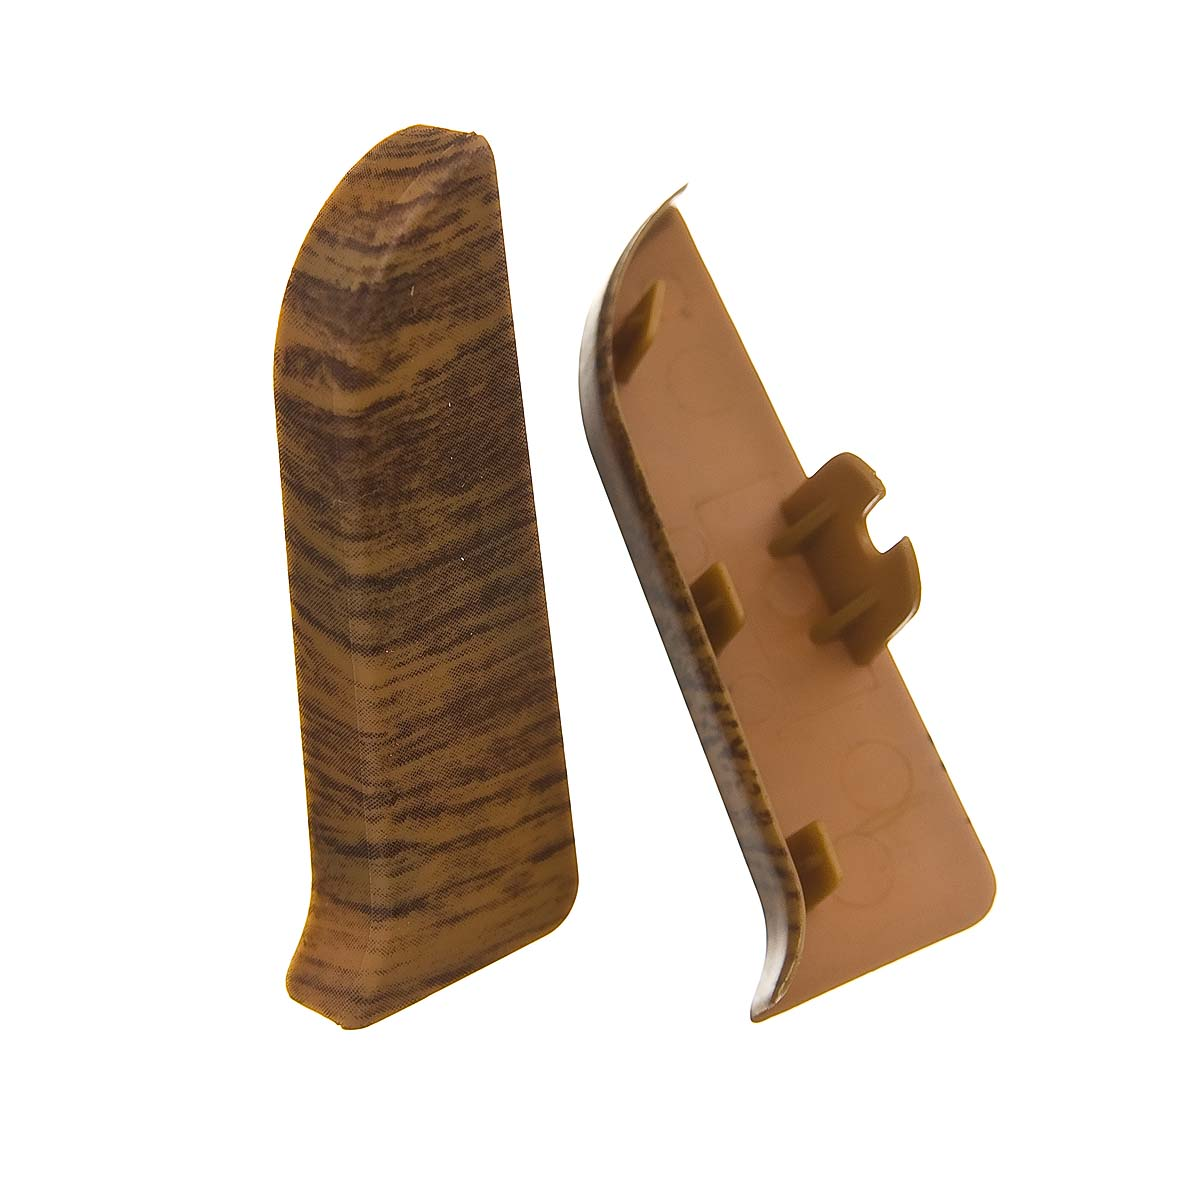 Заглушки торцевые (левая+правая) к плинтусу 68 мм ятоба Nexus